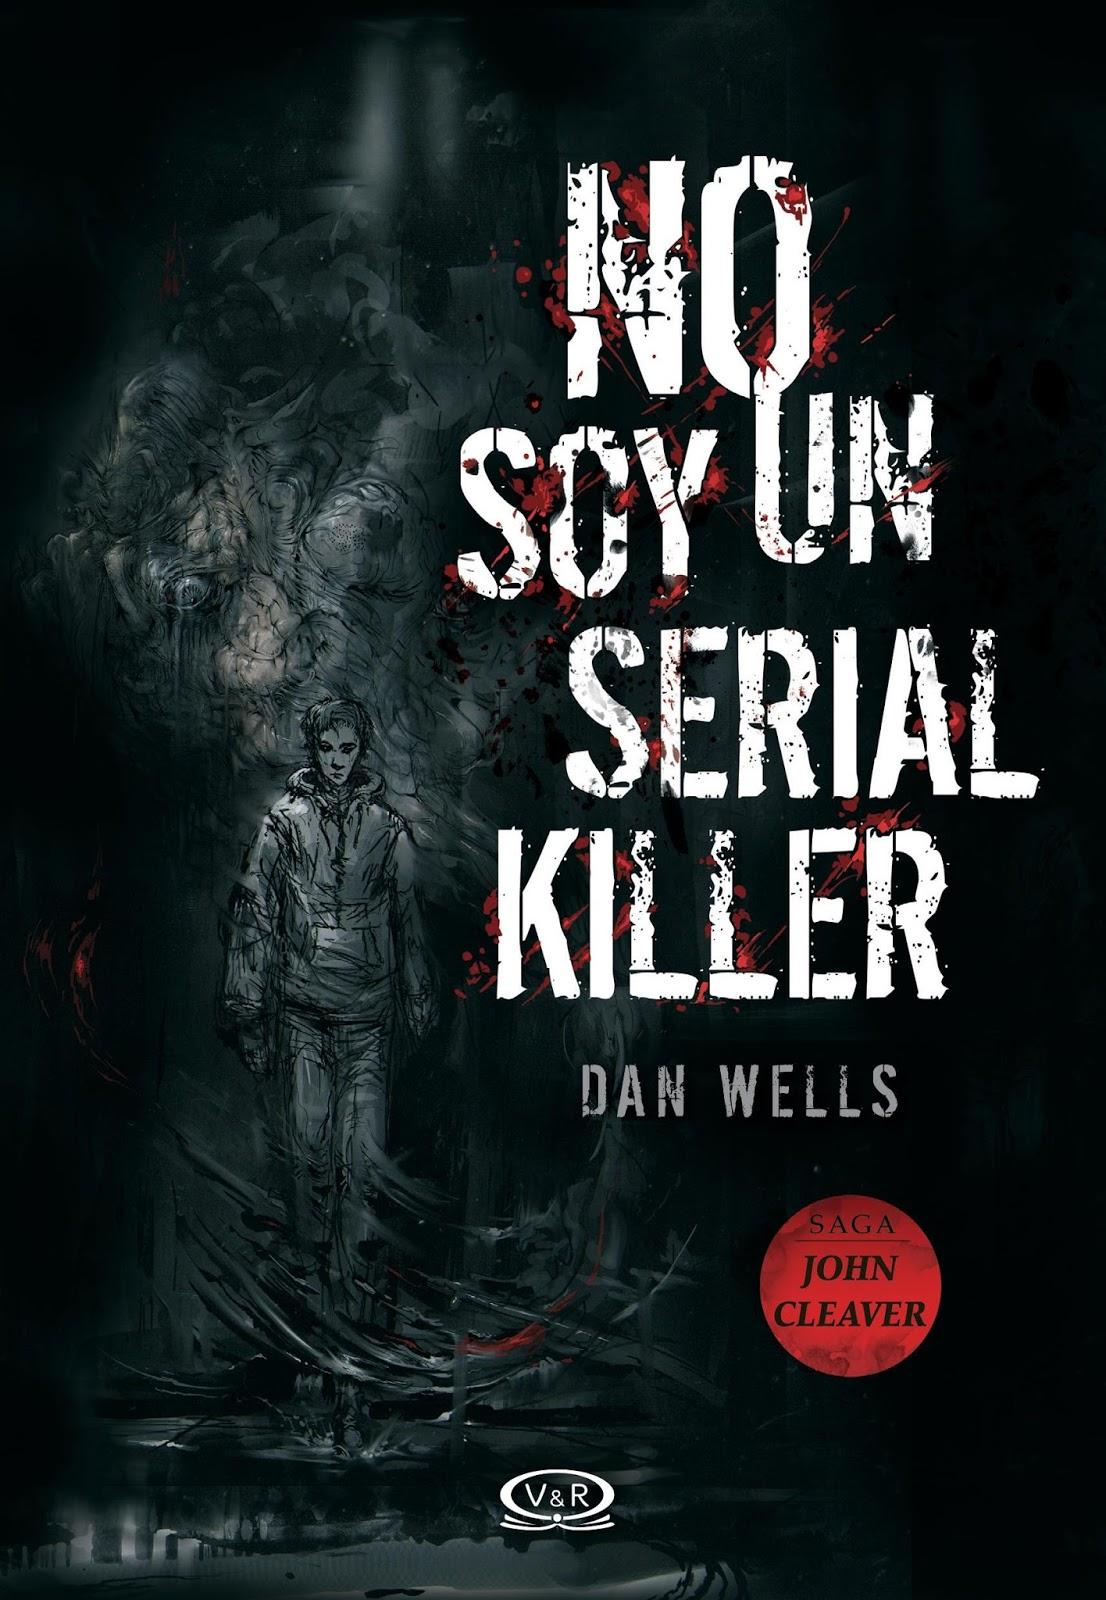 ADAPTACIÓN (anual) - Página 2 No-soy-un-serial-killer-dan-wells-john-cleaver-saga